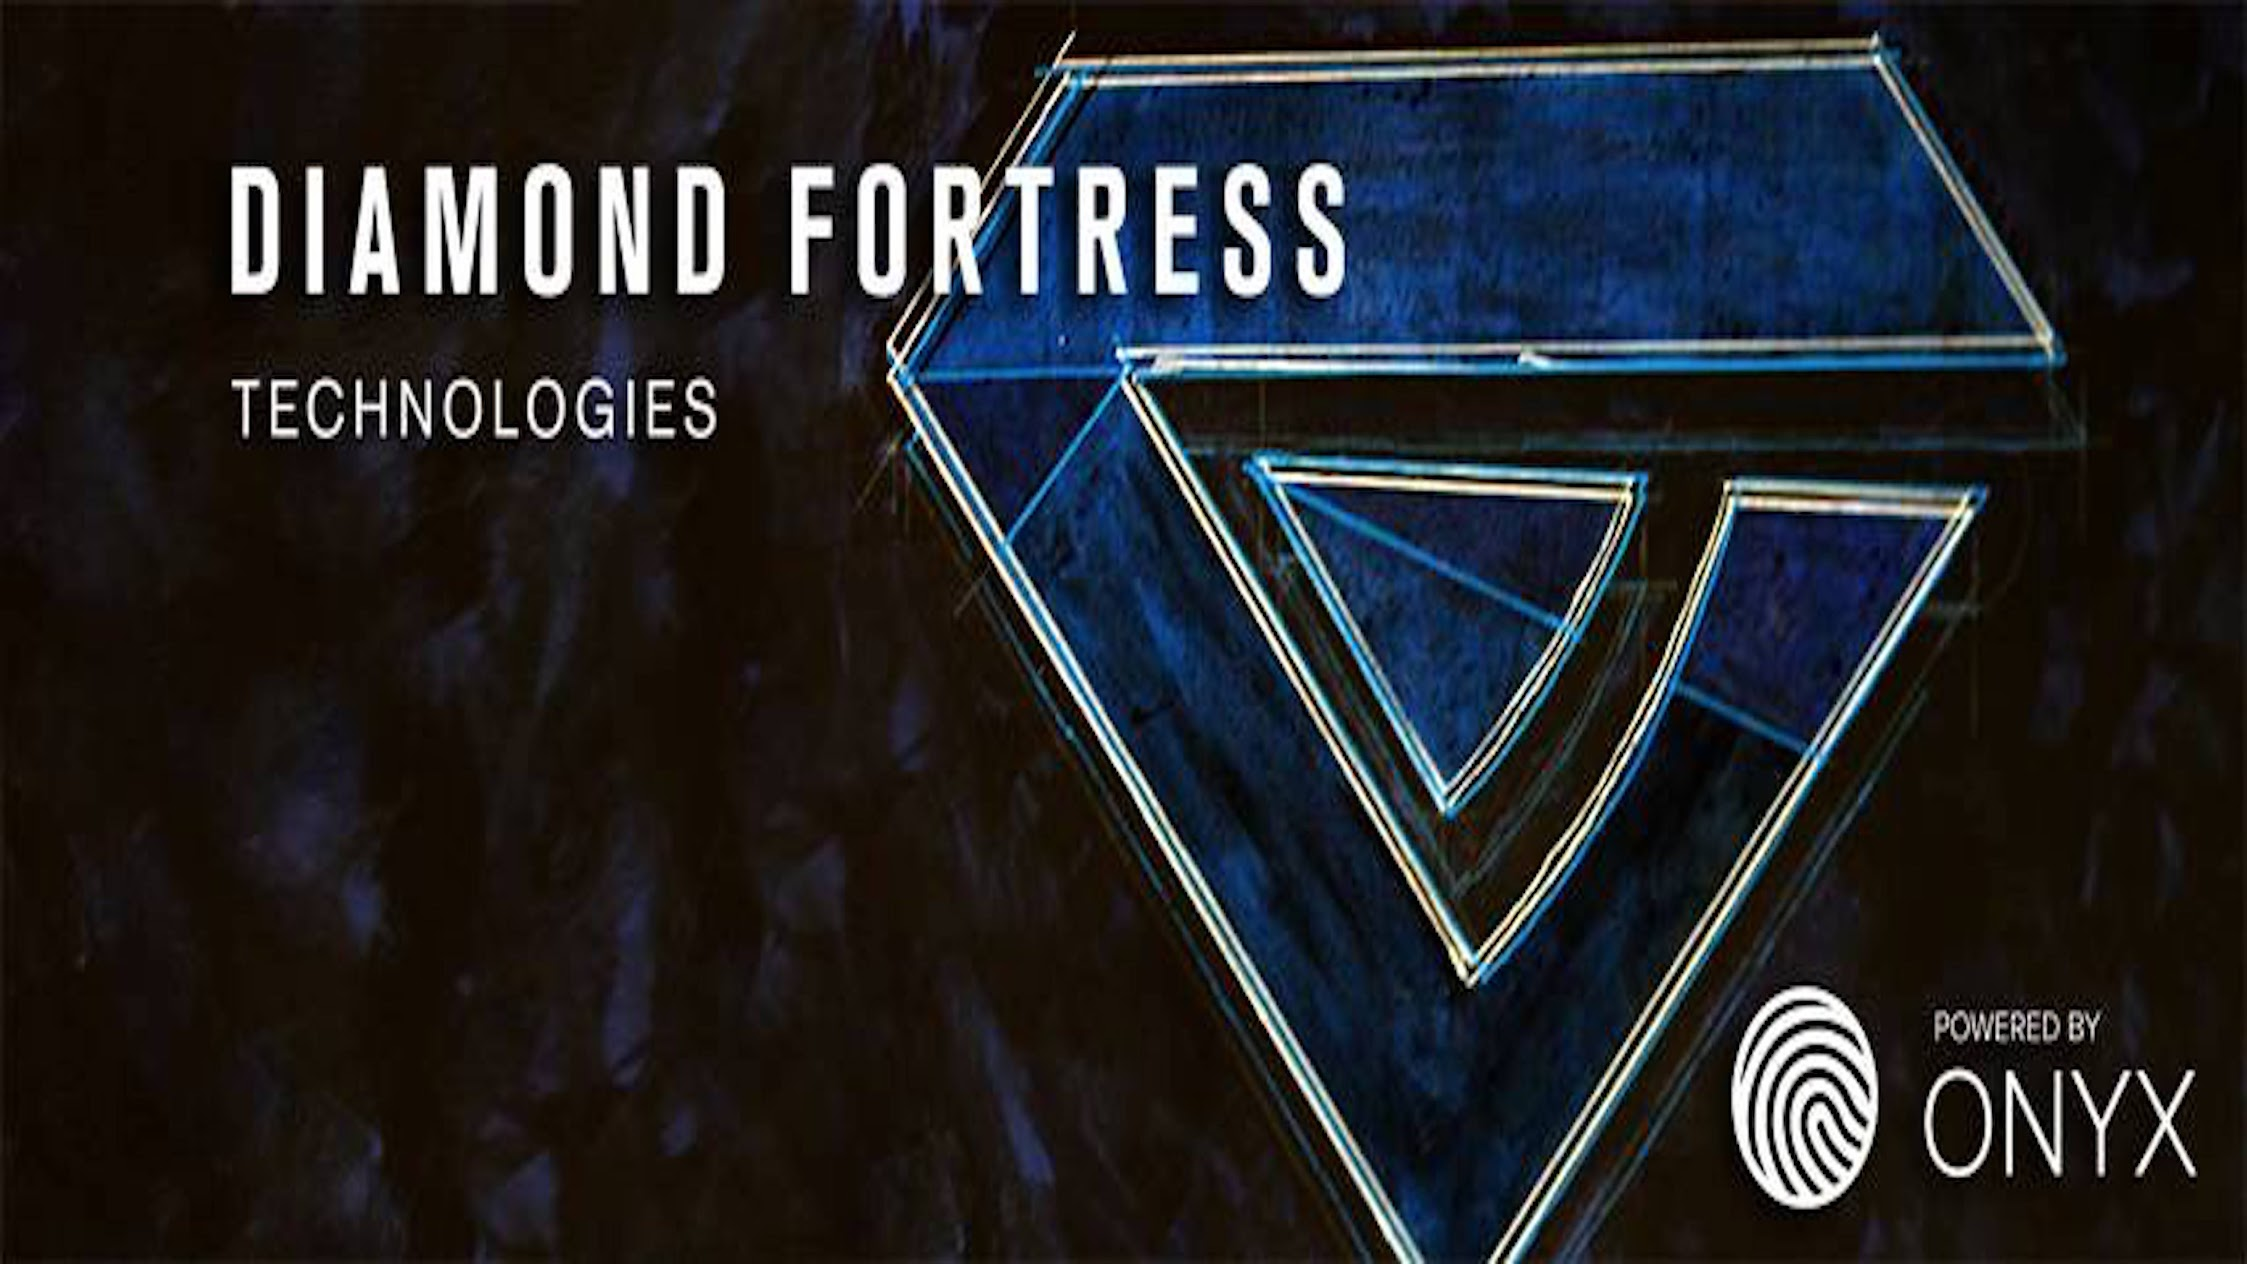 Diamond Fortress Technologies, Inc.